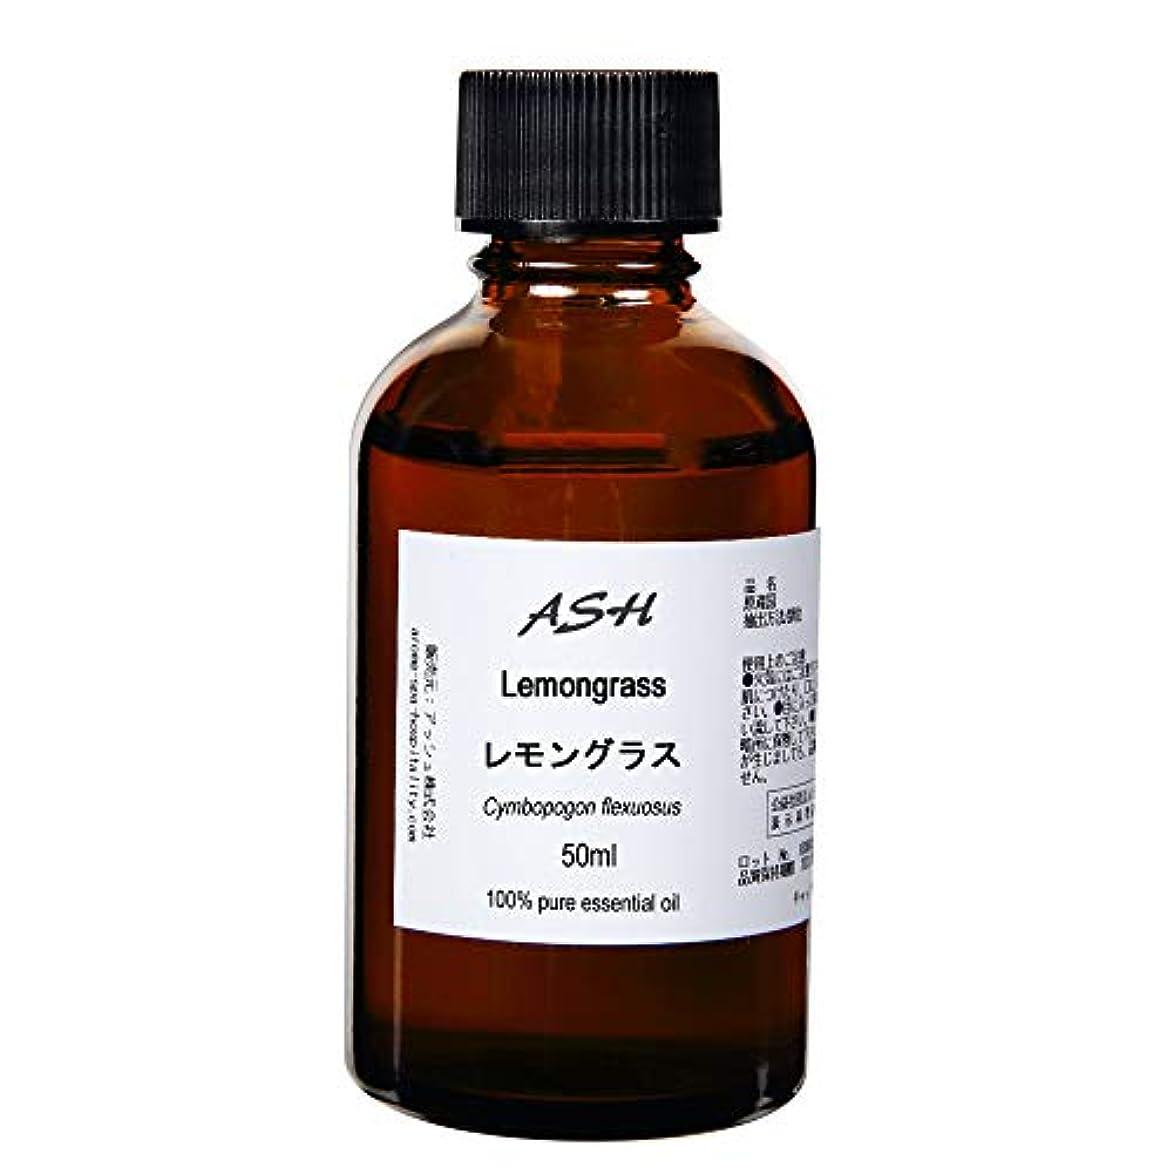 ASH レモングラス エッセンシャルオイル 50ml AEAJ表示基準適合認定精油